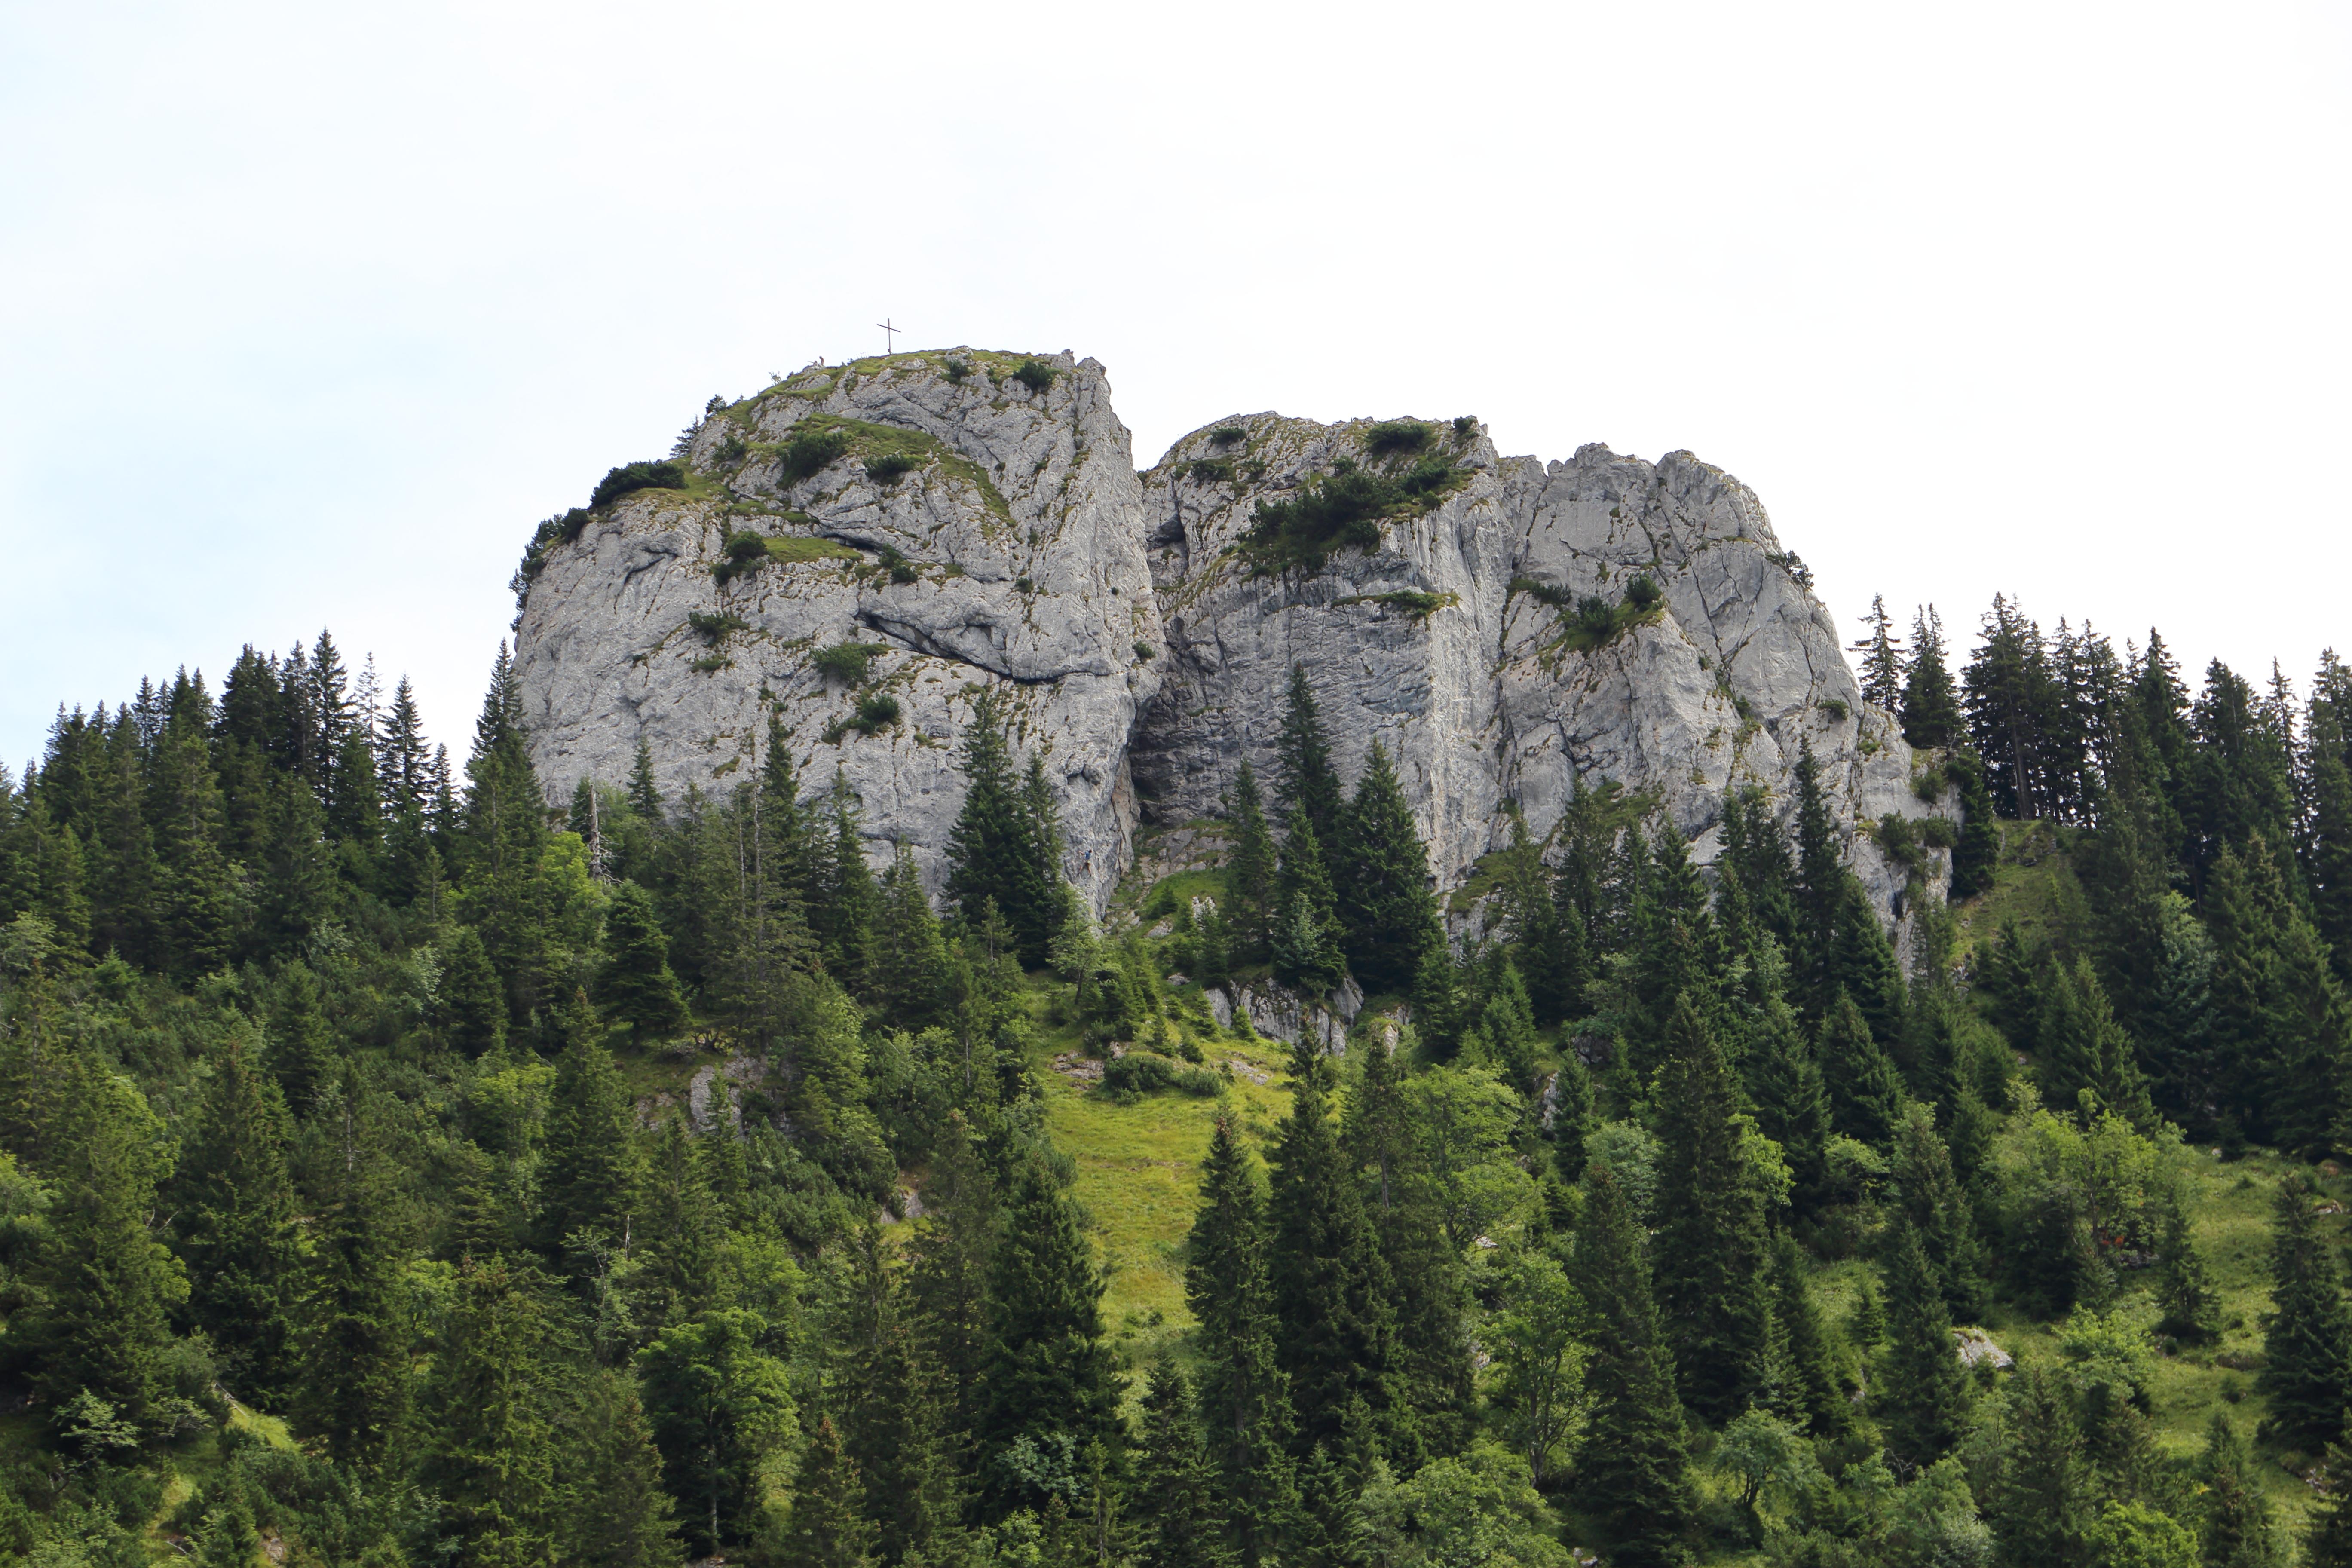 Ettaler Mandl Klettersteig Unfall : Ettaler manndl wikiwand